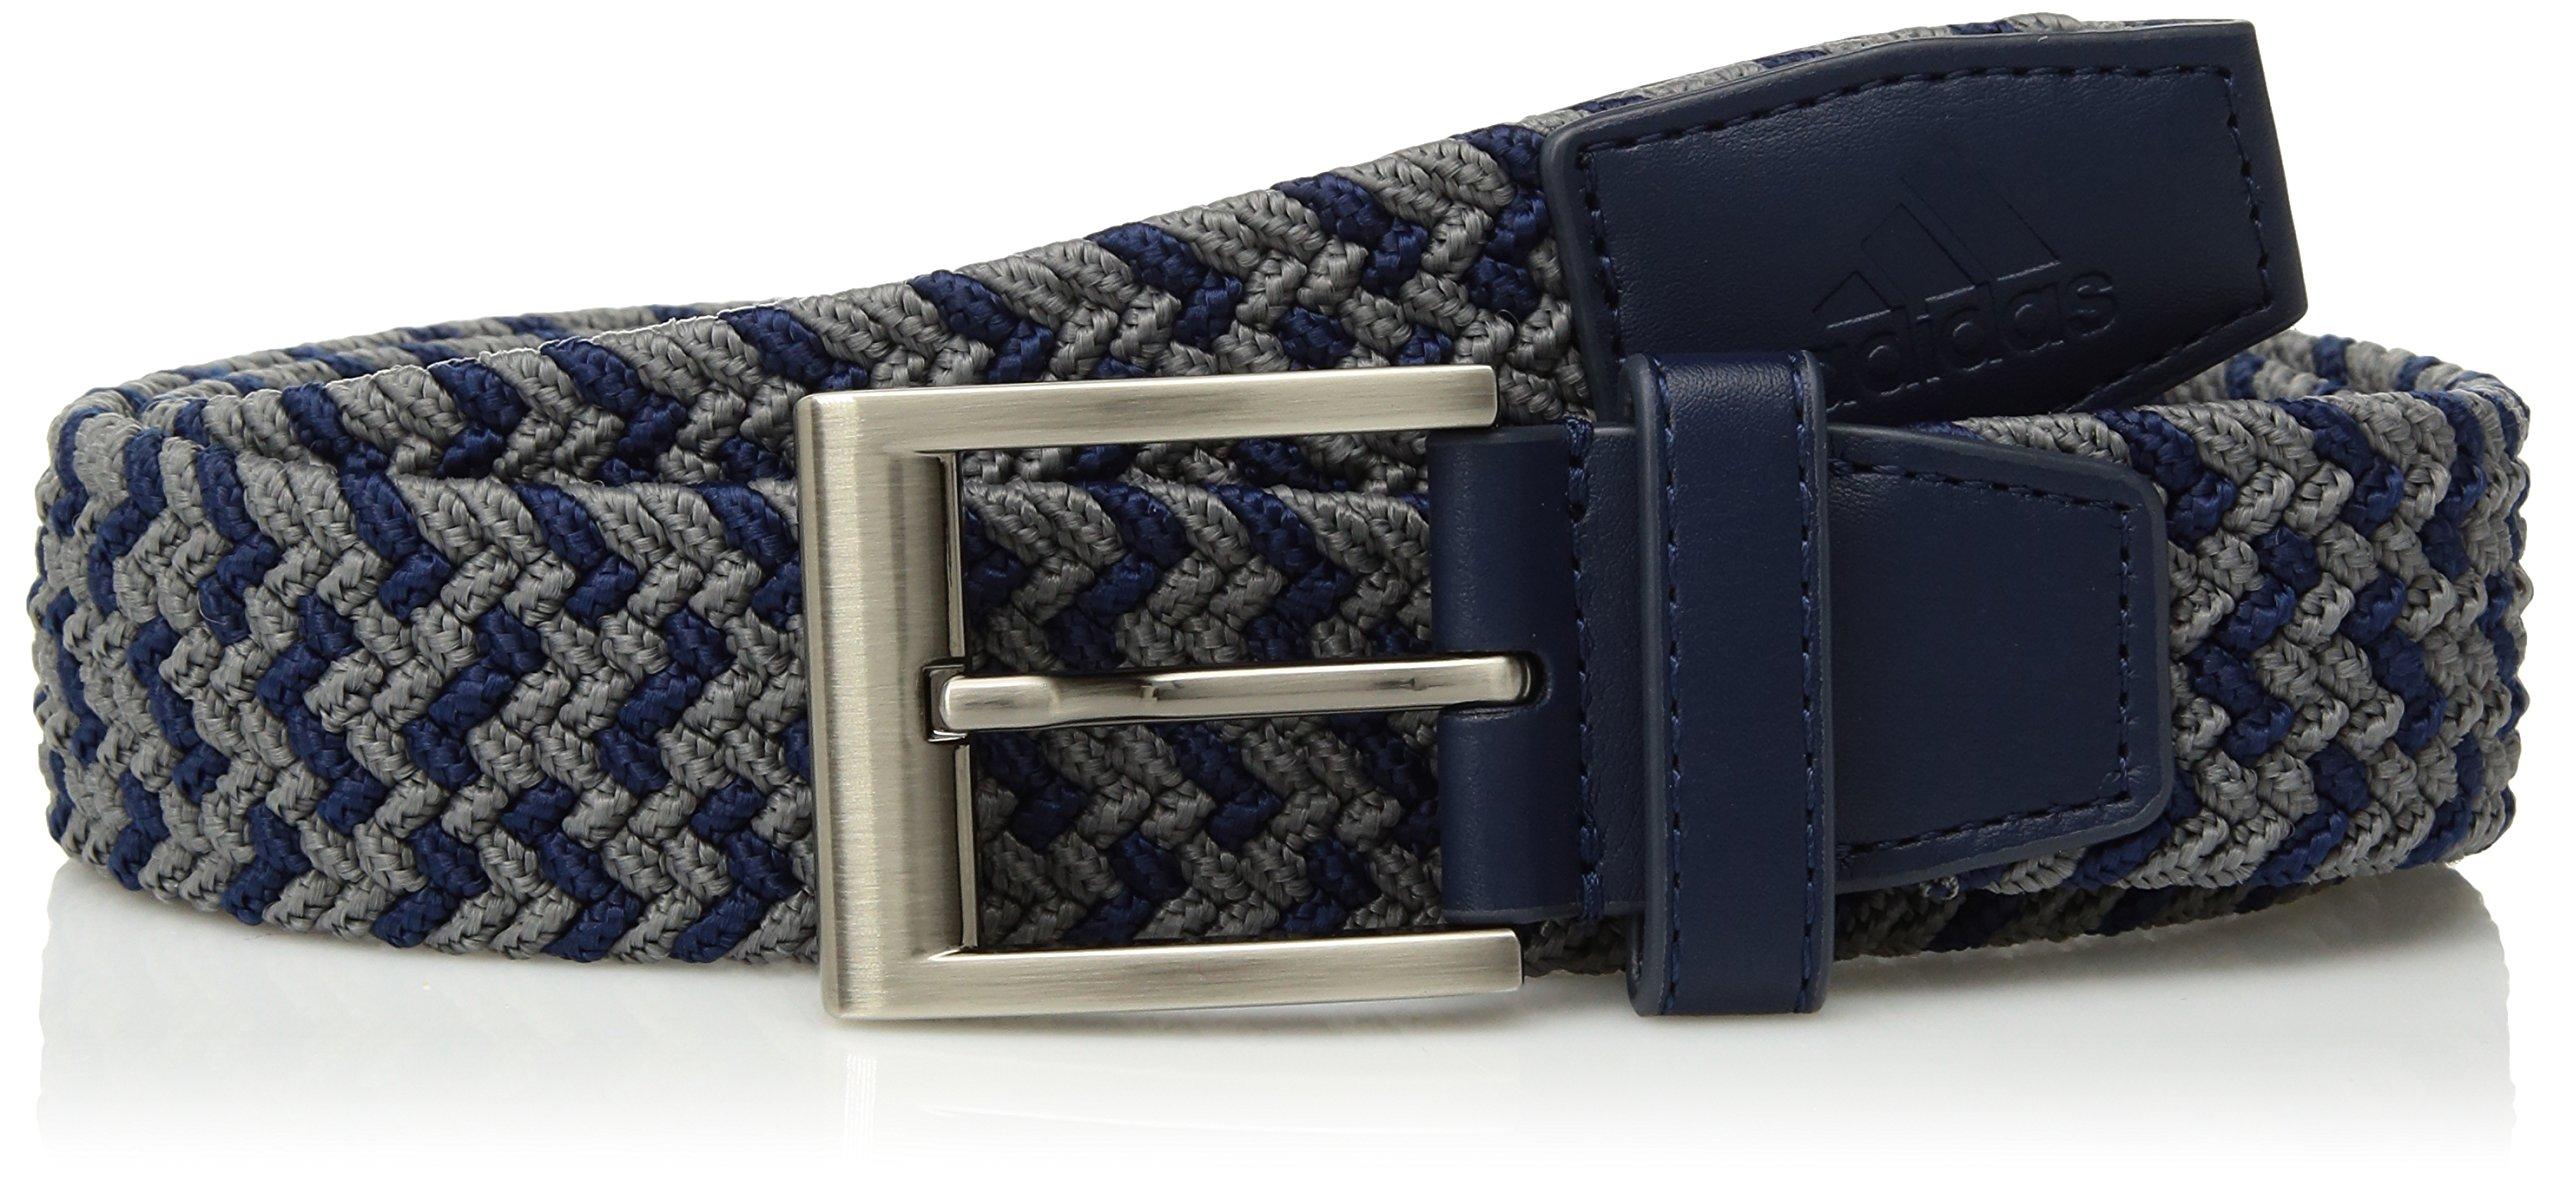 adidas Golf Men's Braided Weave Stretch Belt, Collegiate Navy/Grey Three, Small/Medium